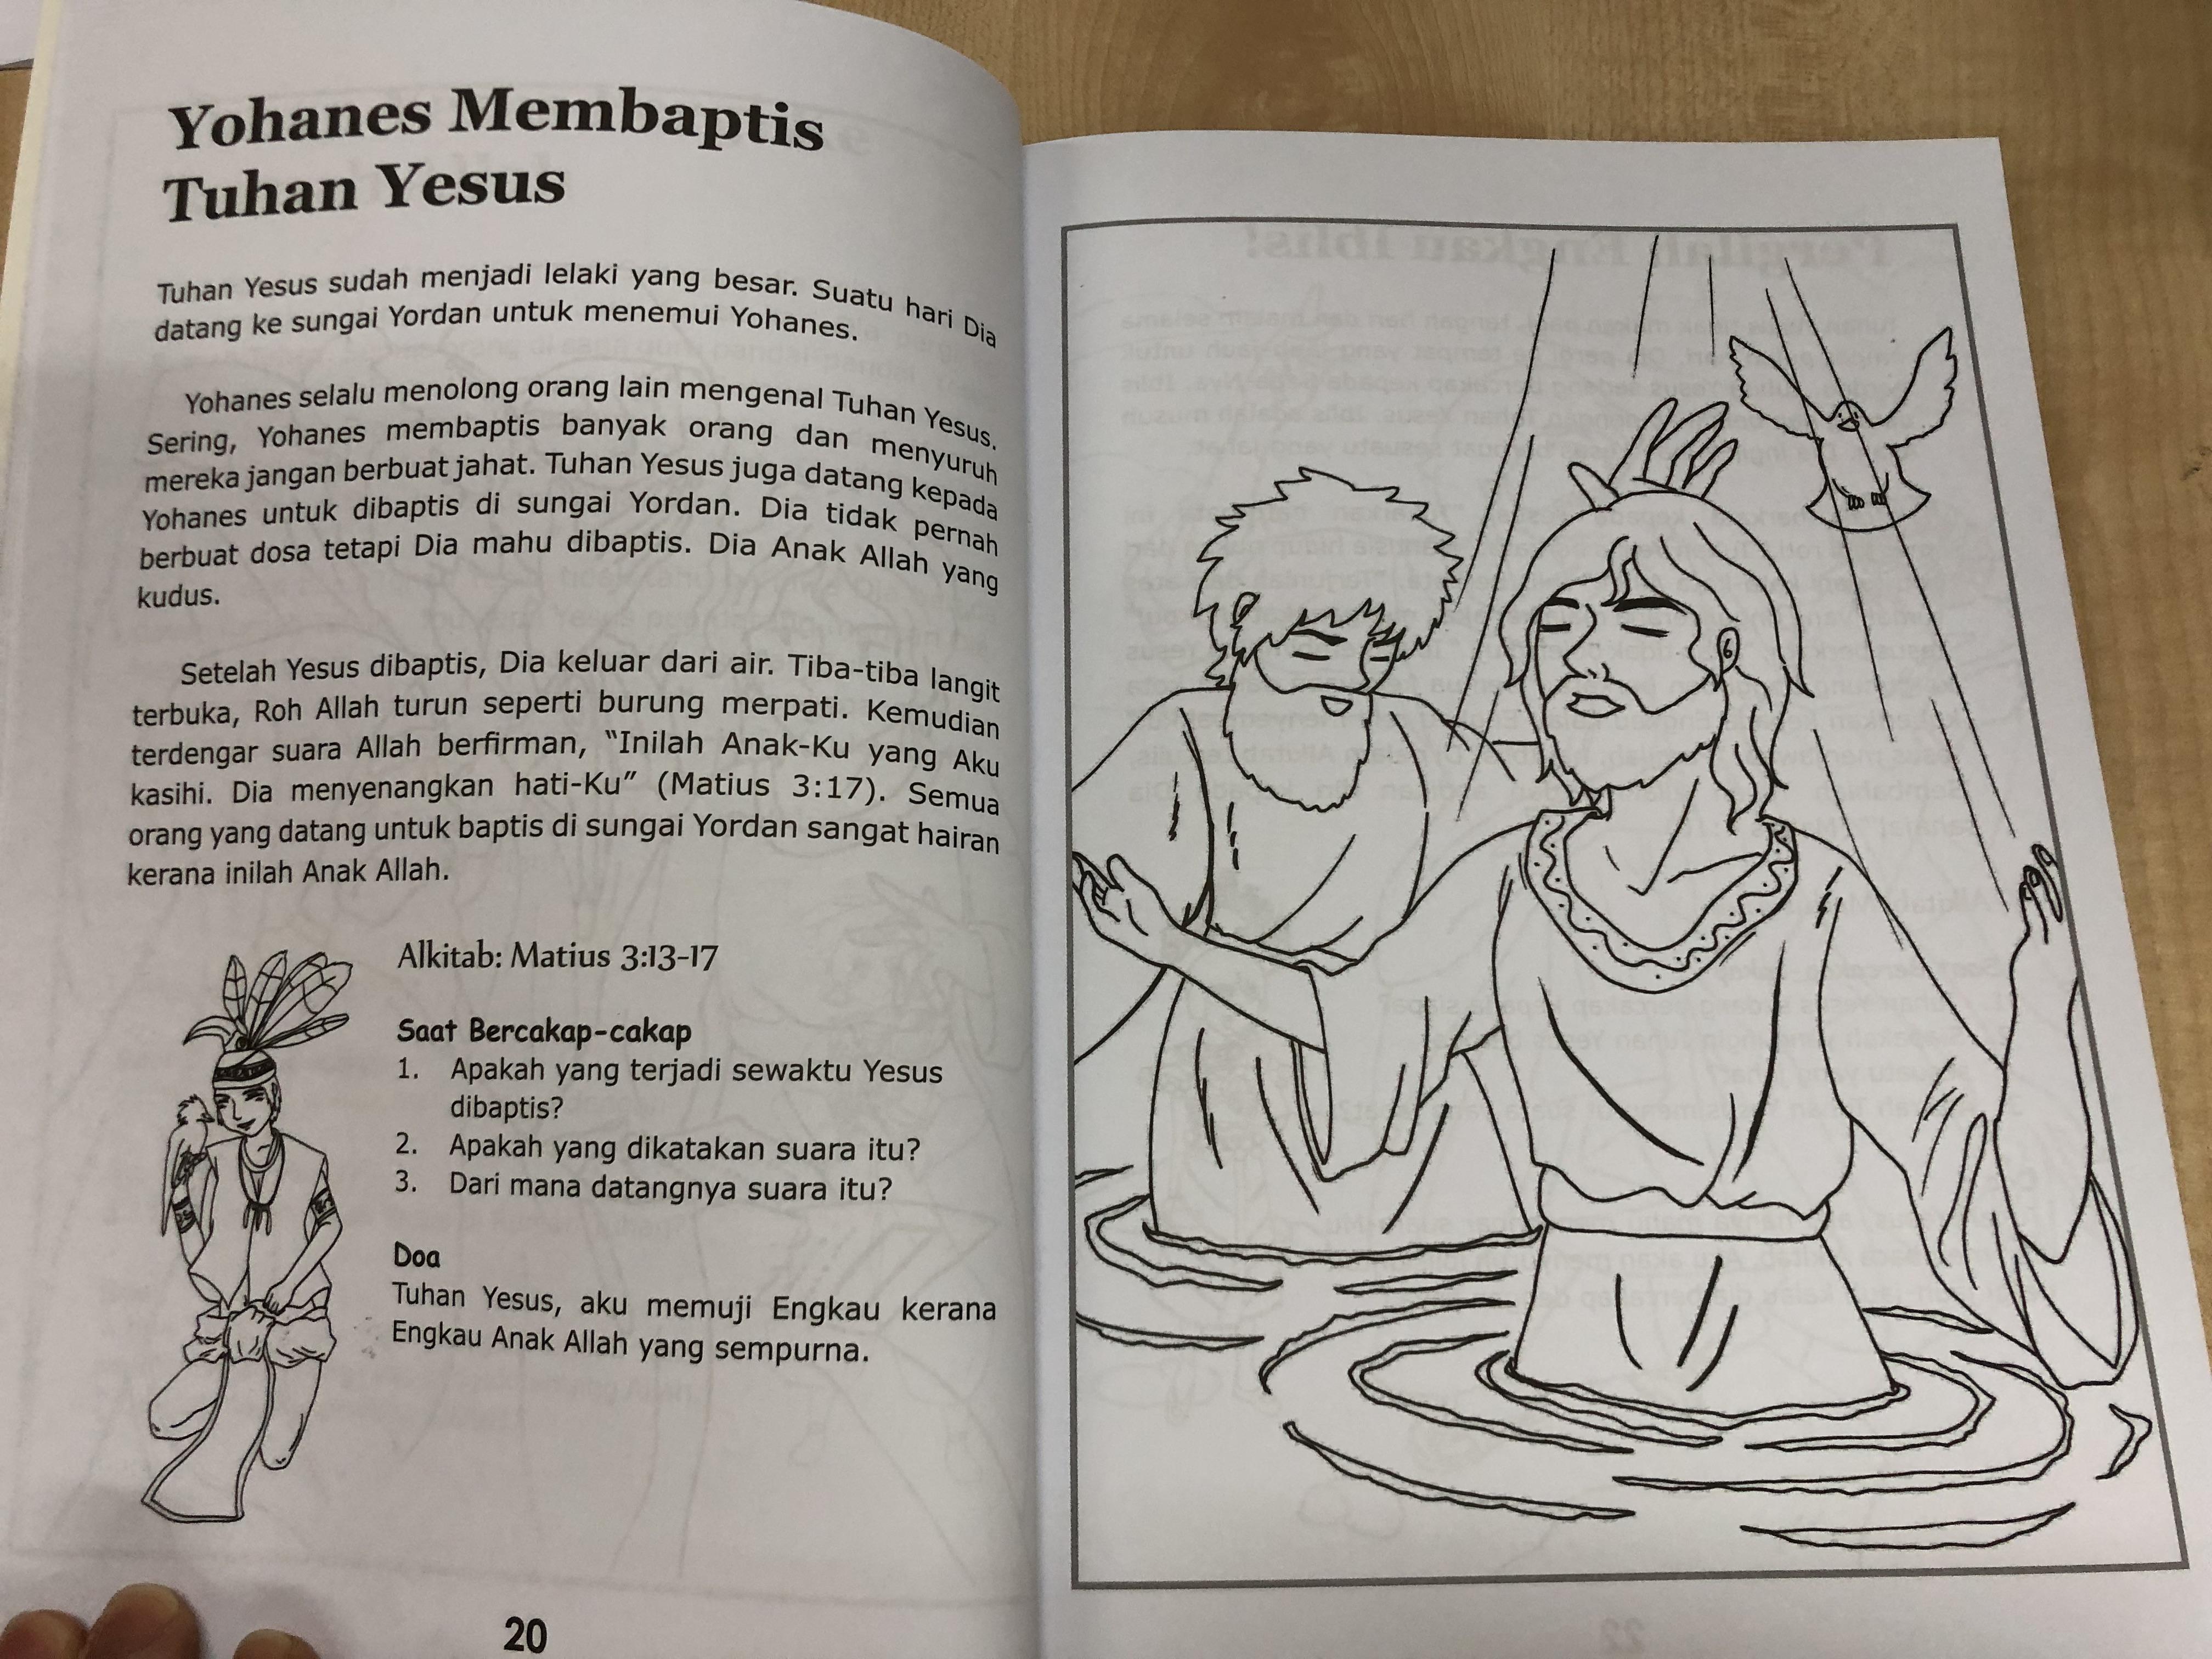 Pelita Untuk Kaki Kaki Kecil Lamp Unto Small Feet Bible Stories For Children In Malay Language With 72 Coloring Pages Evelyn Tan Hwee Yong